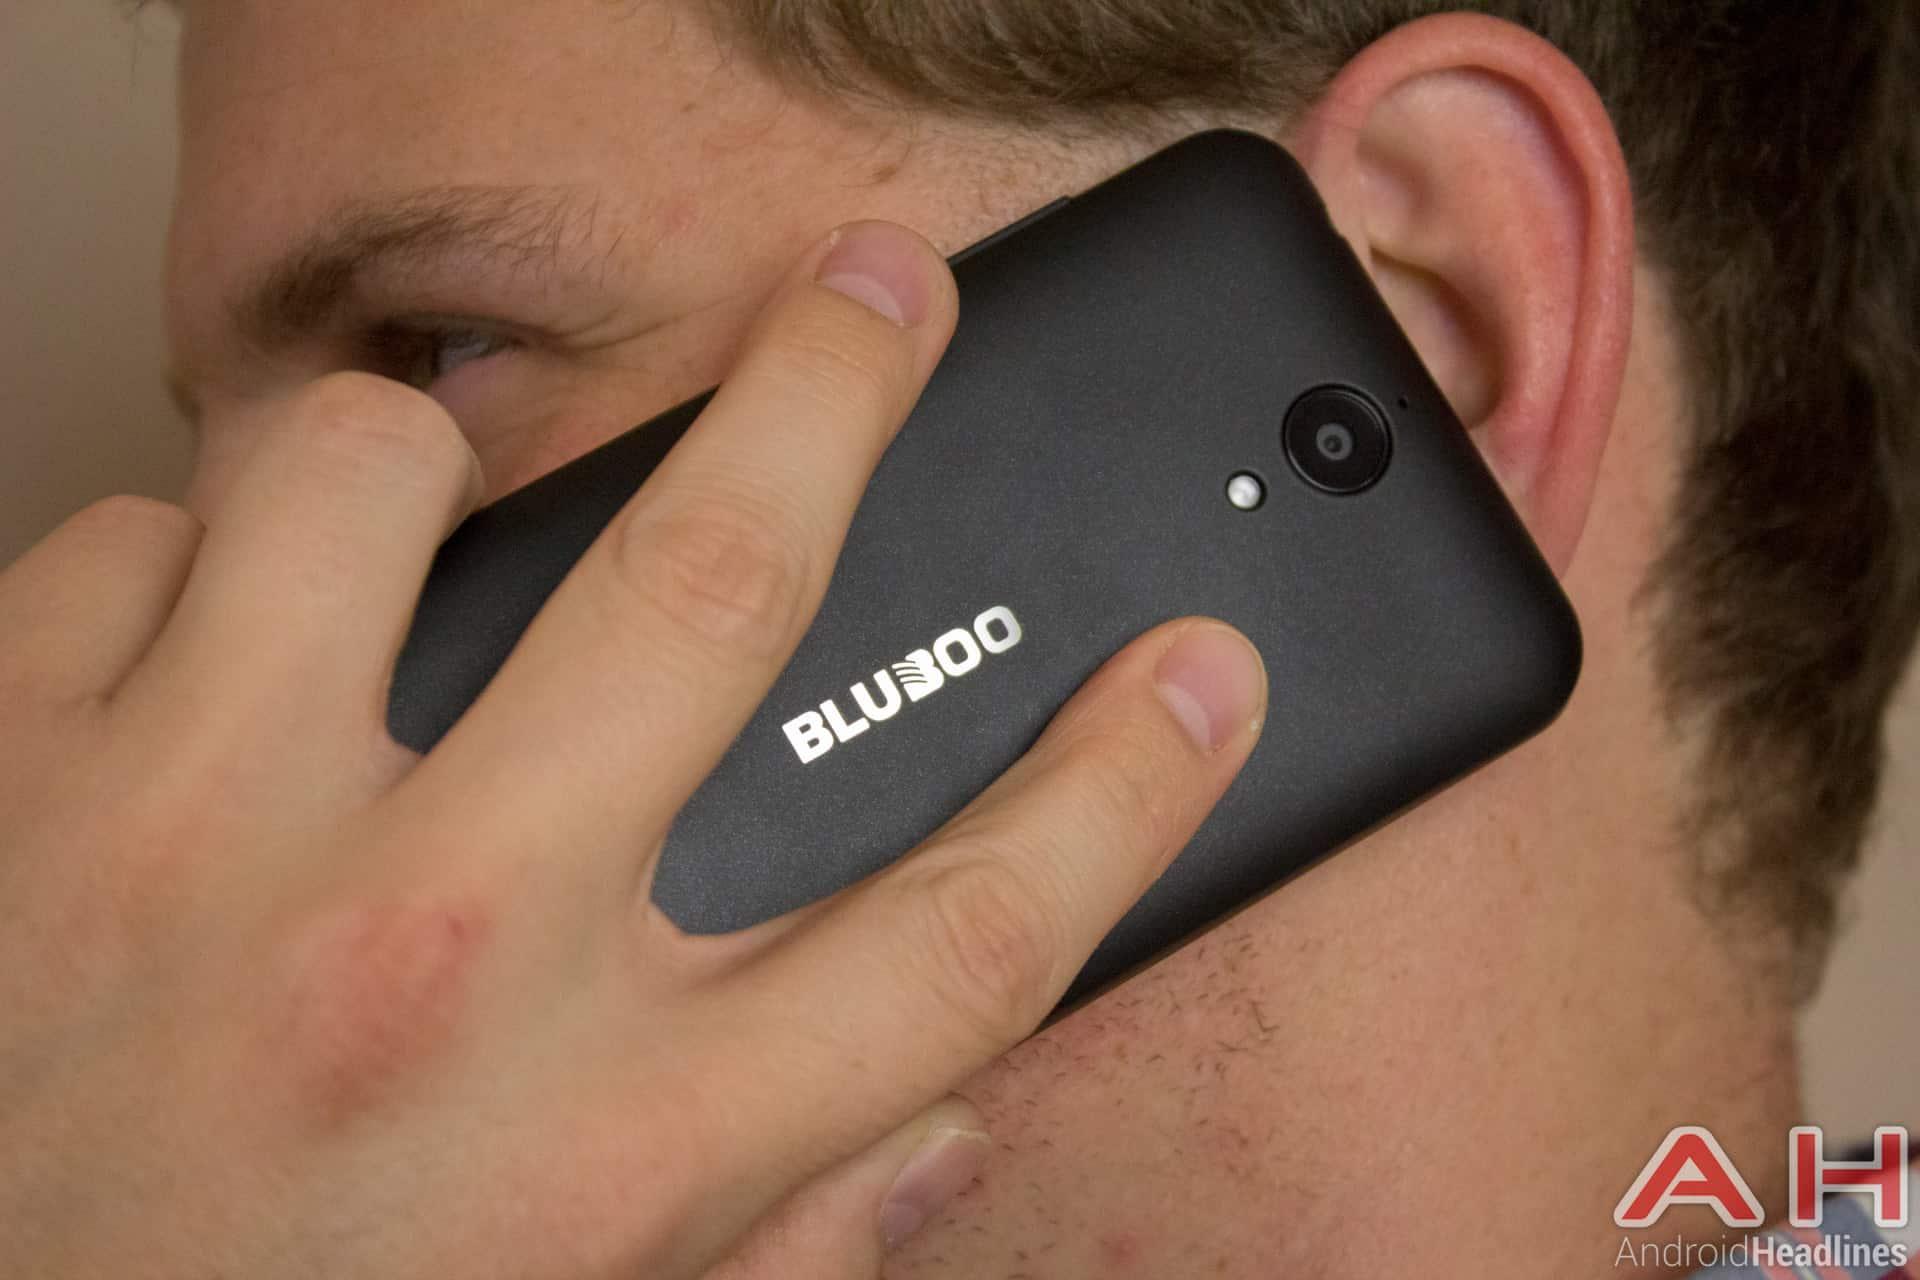 Bluboo-XFire-AH-NS-phone